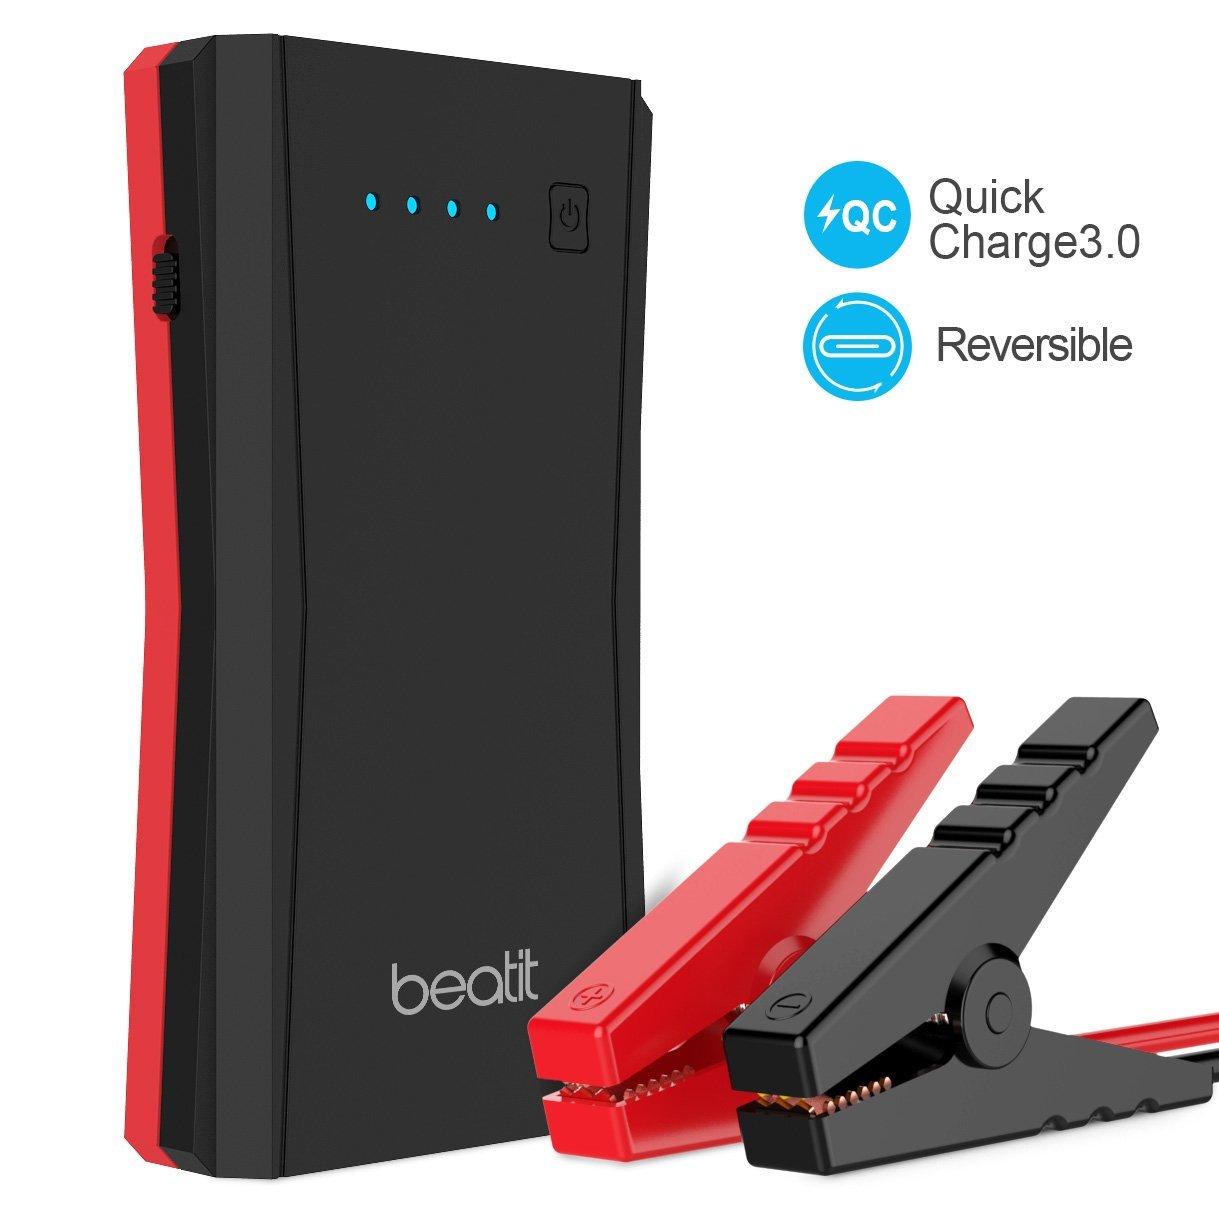 $34 BEATIT TECH 500A Peak 10800mAh Portable Jump Starter Power Pack Phone Power Bank With USB Type-C & QC 3.0